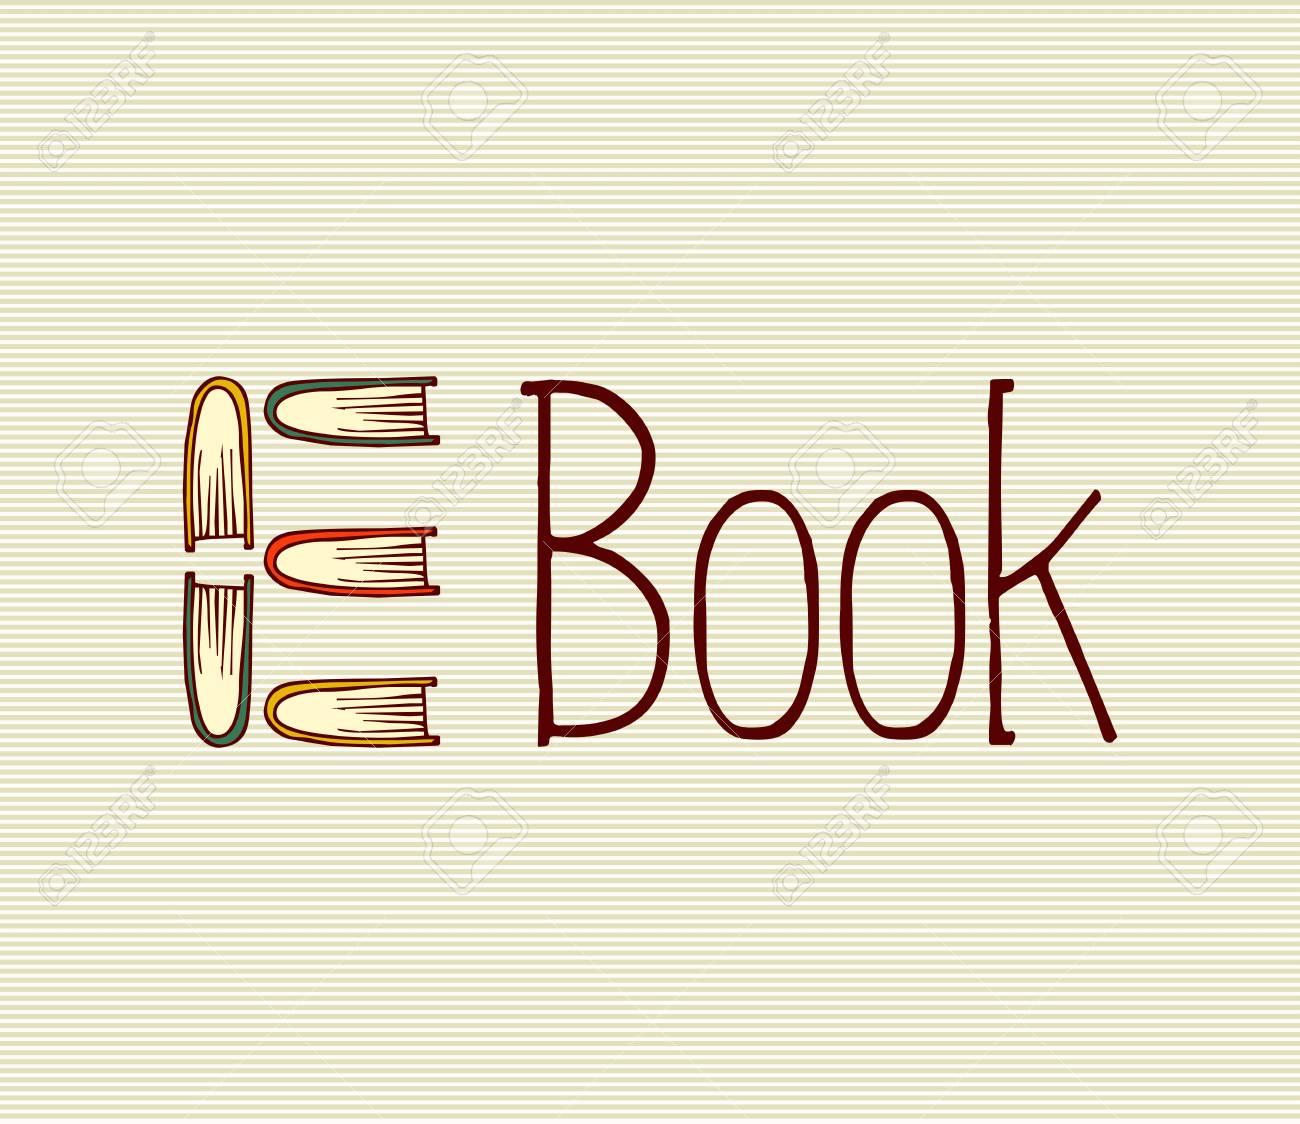 Retro electronic book text illustration. Stock Vector - 21509491